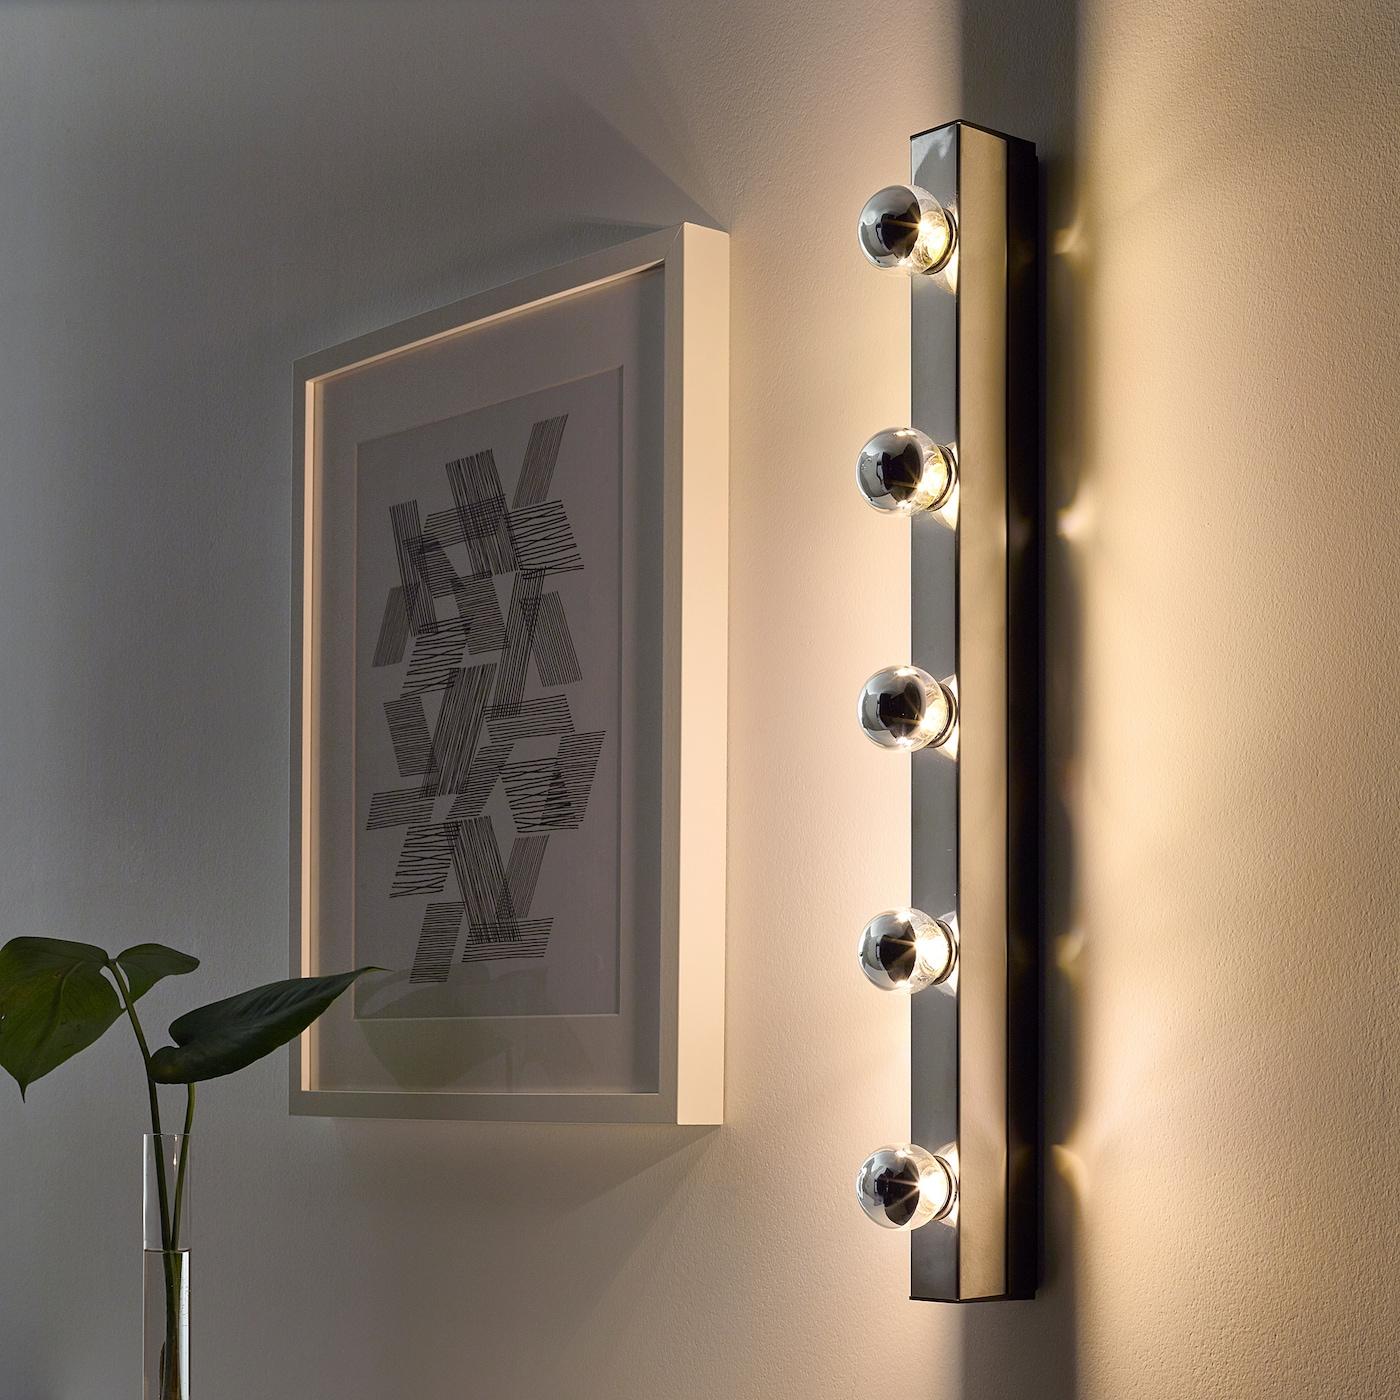 9 W LED Chrom Wand Leuchte Glas Spiegel Rand Beleuchtung